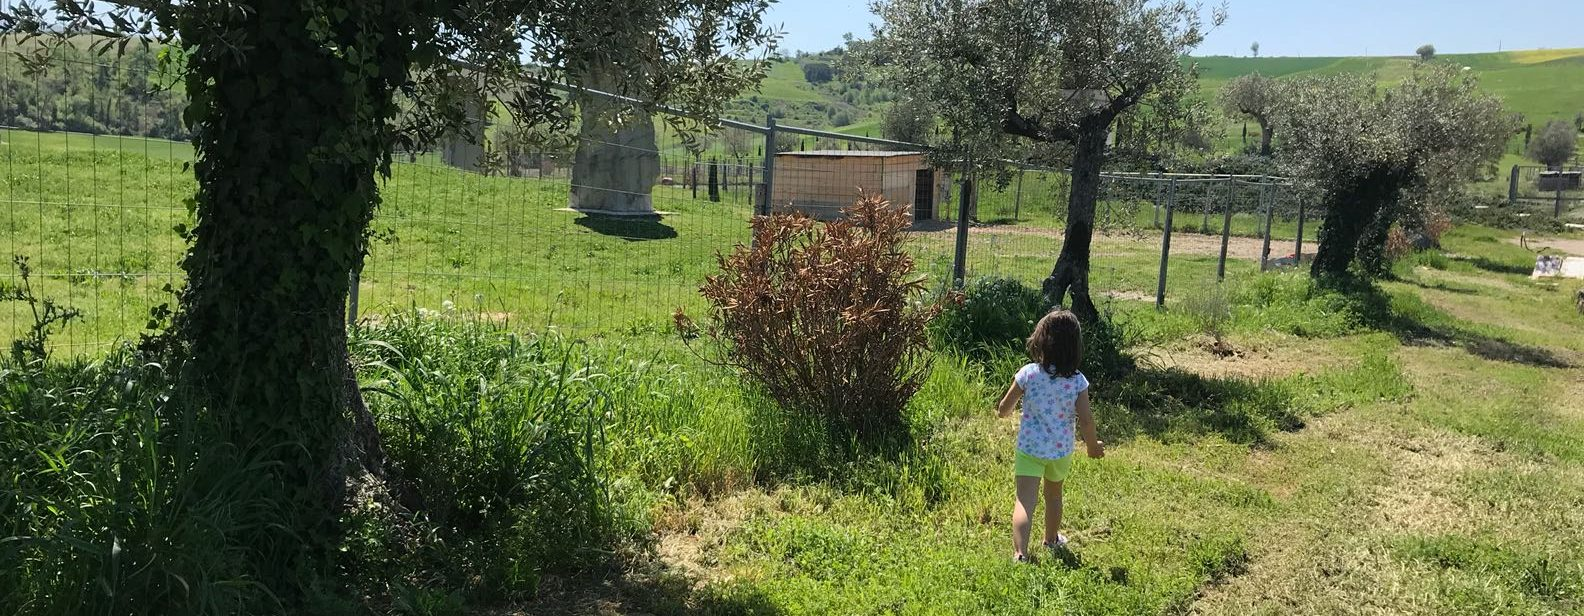 Cosa fare con i bambini in Umbria nel Weekend 11-12-13 Maggio: Umbriabimboweekend!